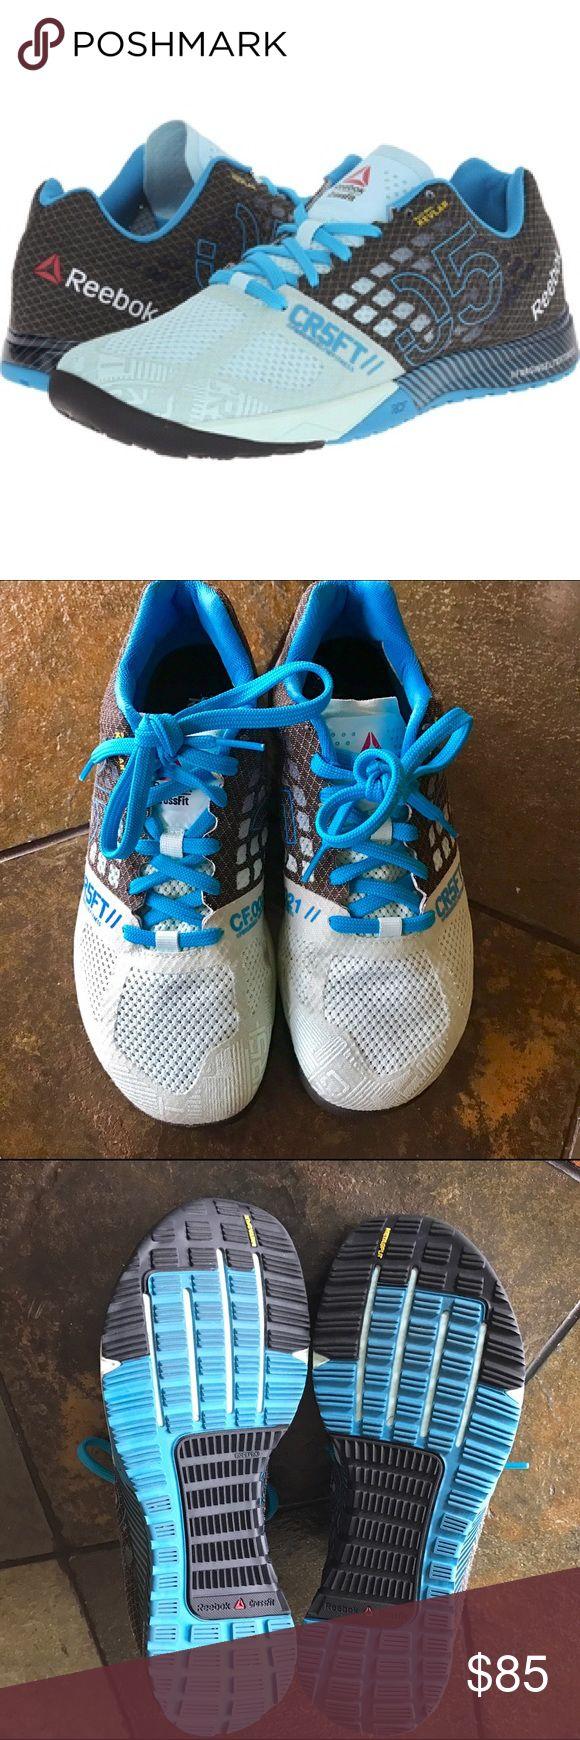 Women's Reebok Crossfit Nano 5 Reebok Nano 5 COOL BREEZE/BLACK/FAR OUT BLUE (light aqua blue & black). Excellent condition. Reebok Shoes Sneakers